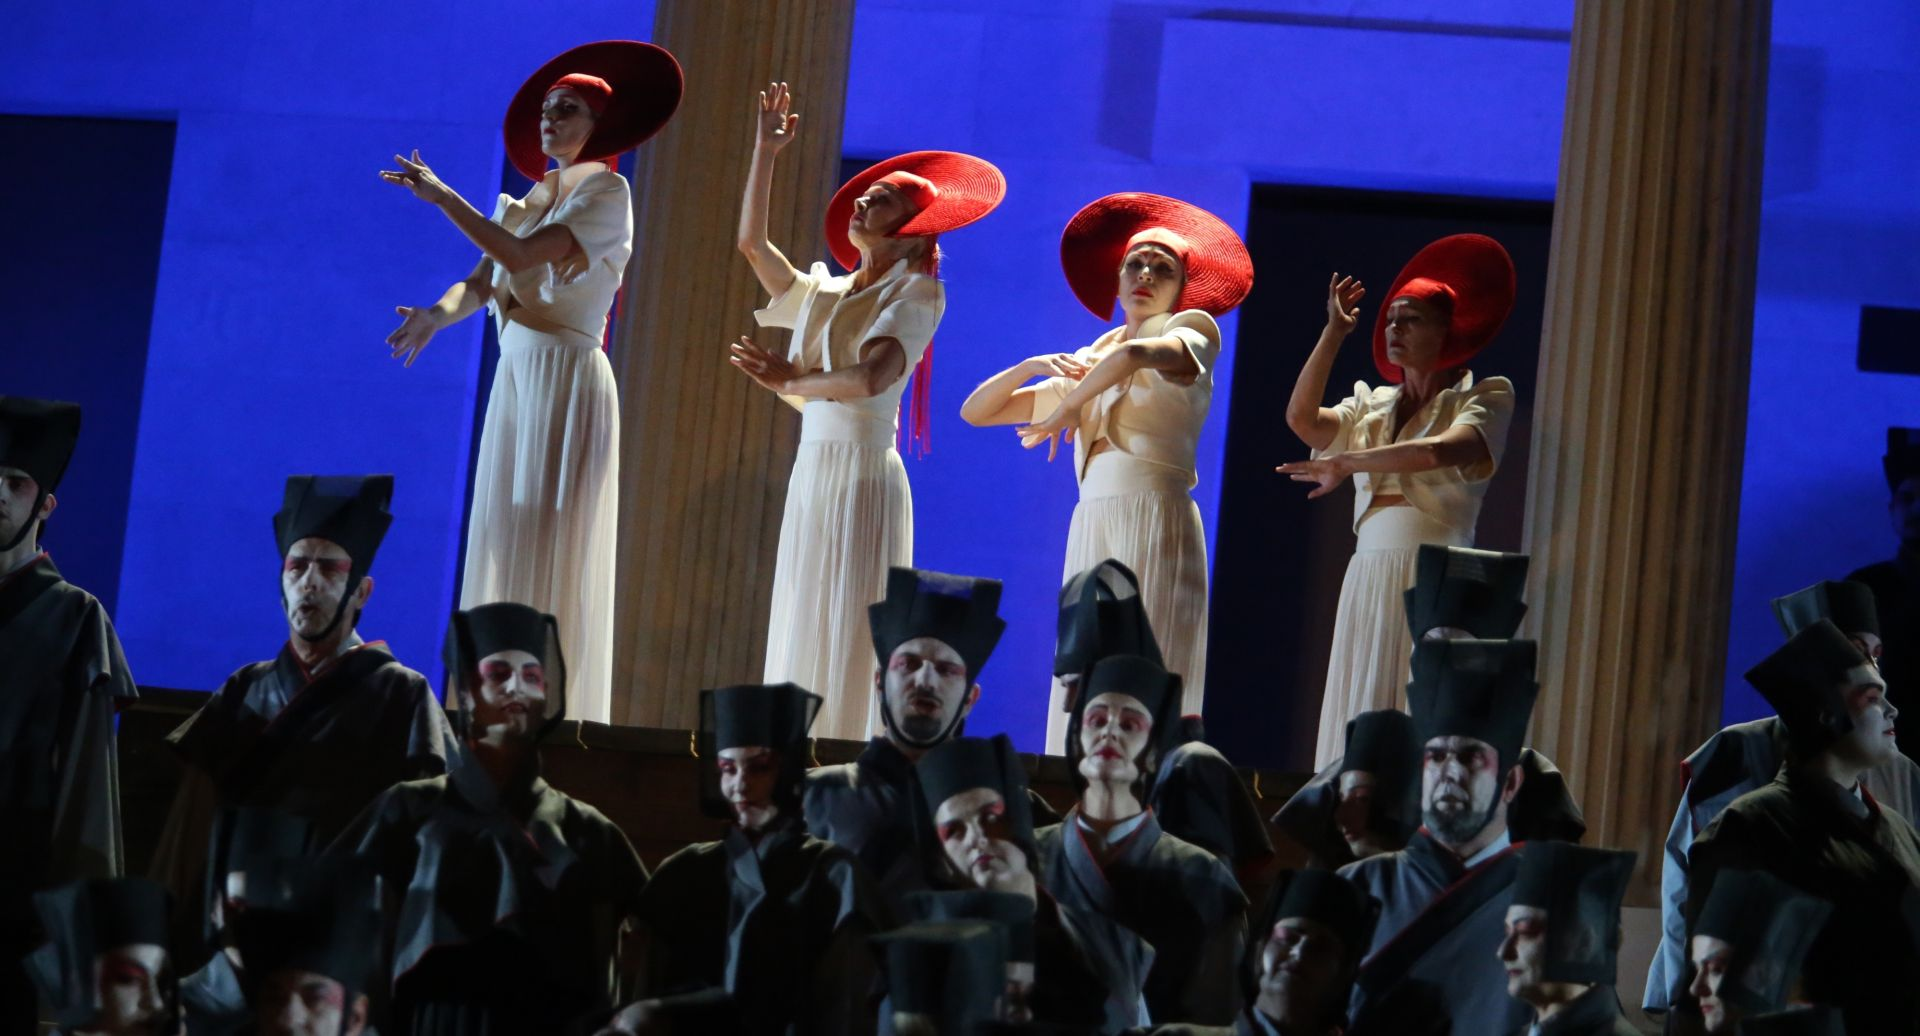 Operom 'Turandot' otvoreno 62. Splitsko ljeto